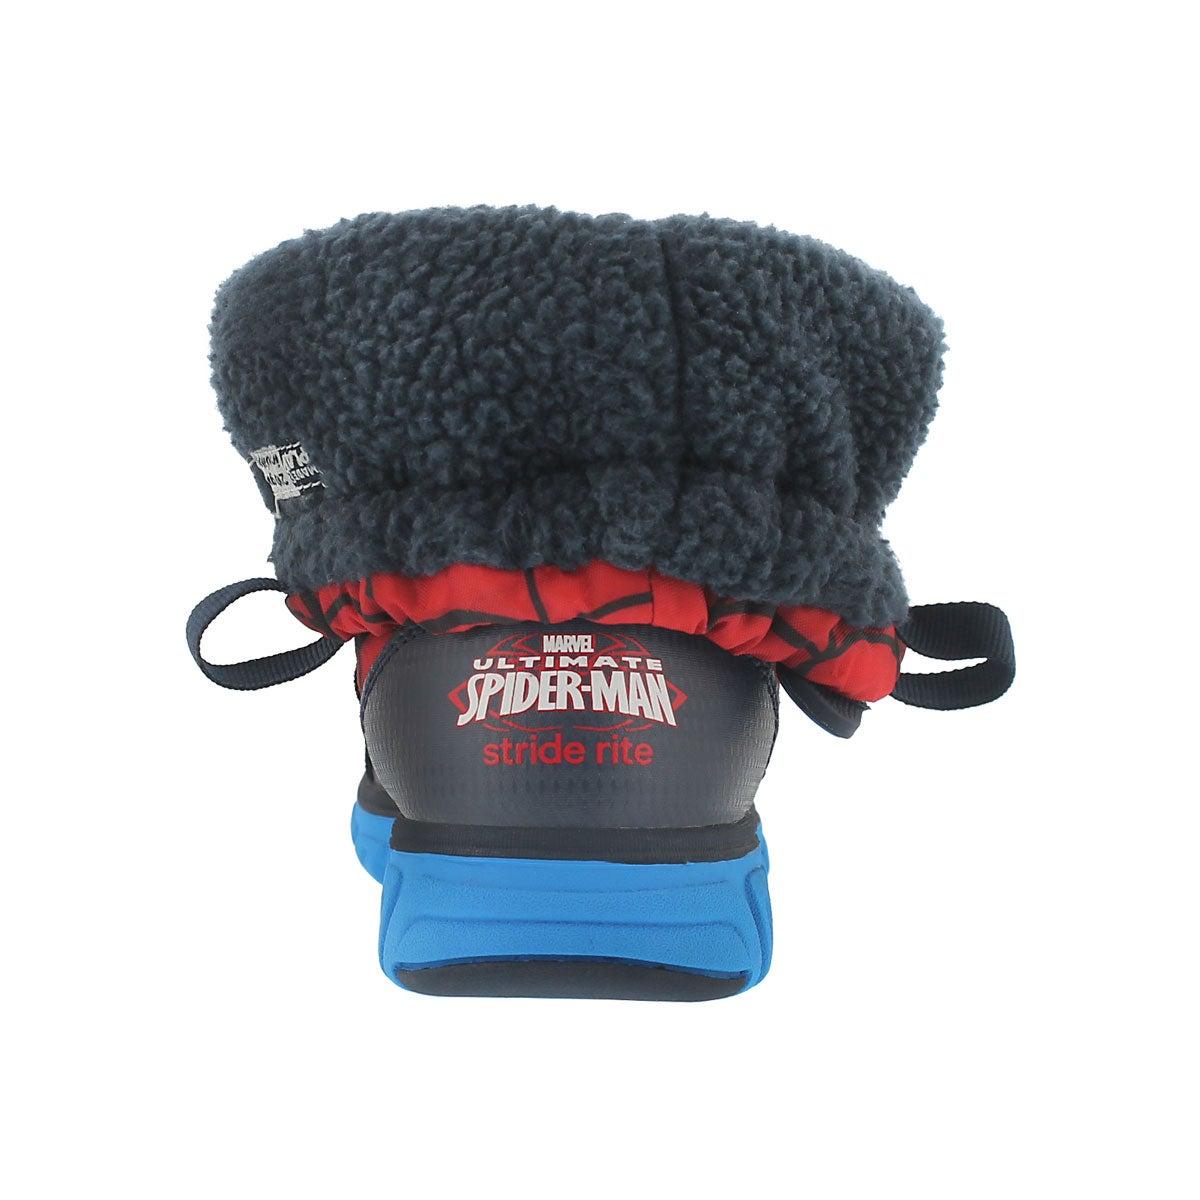 Bys M2P Spiderman red/blu sneaker boot